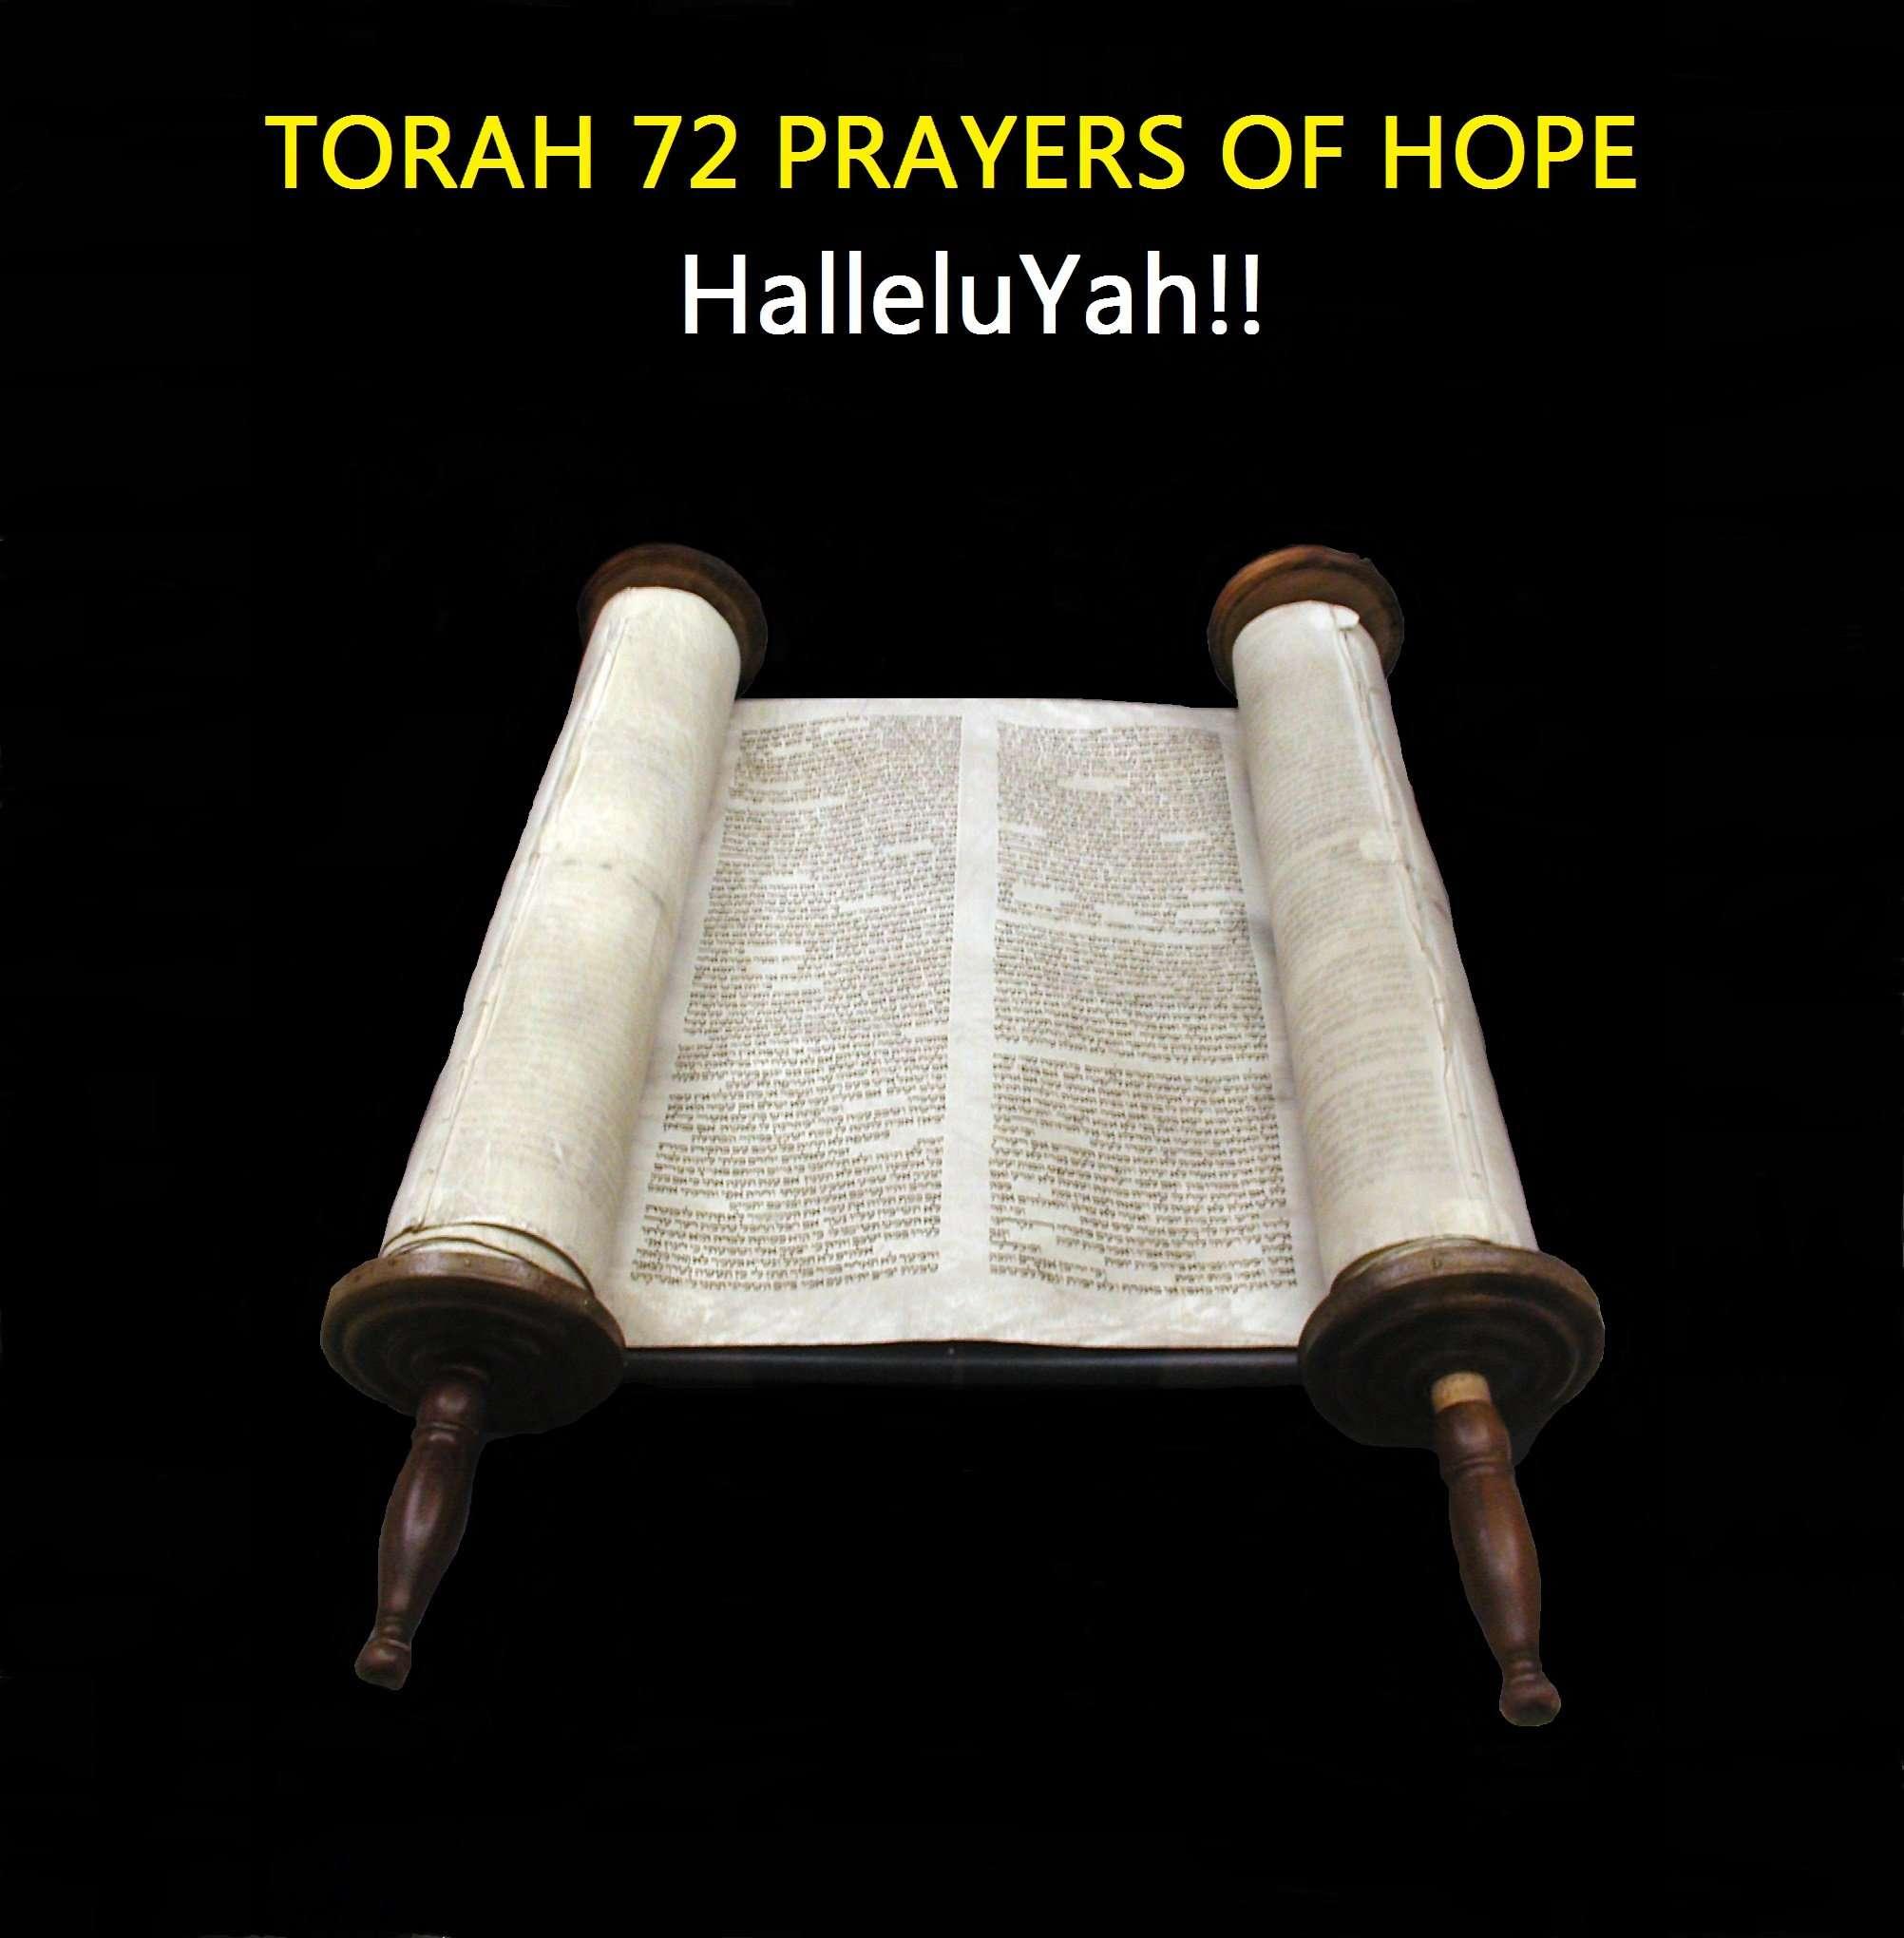 Inspiring Torah 72 Prayers of Hope